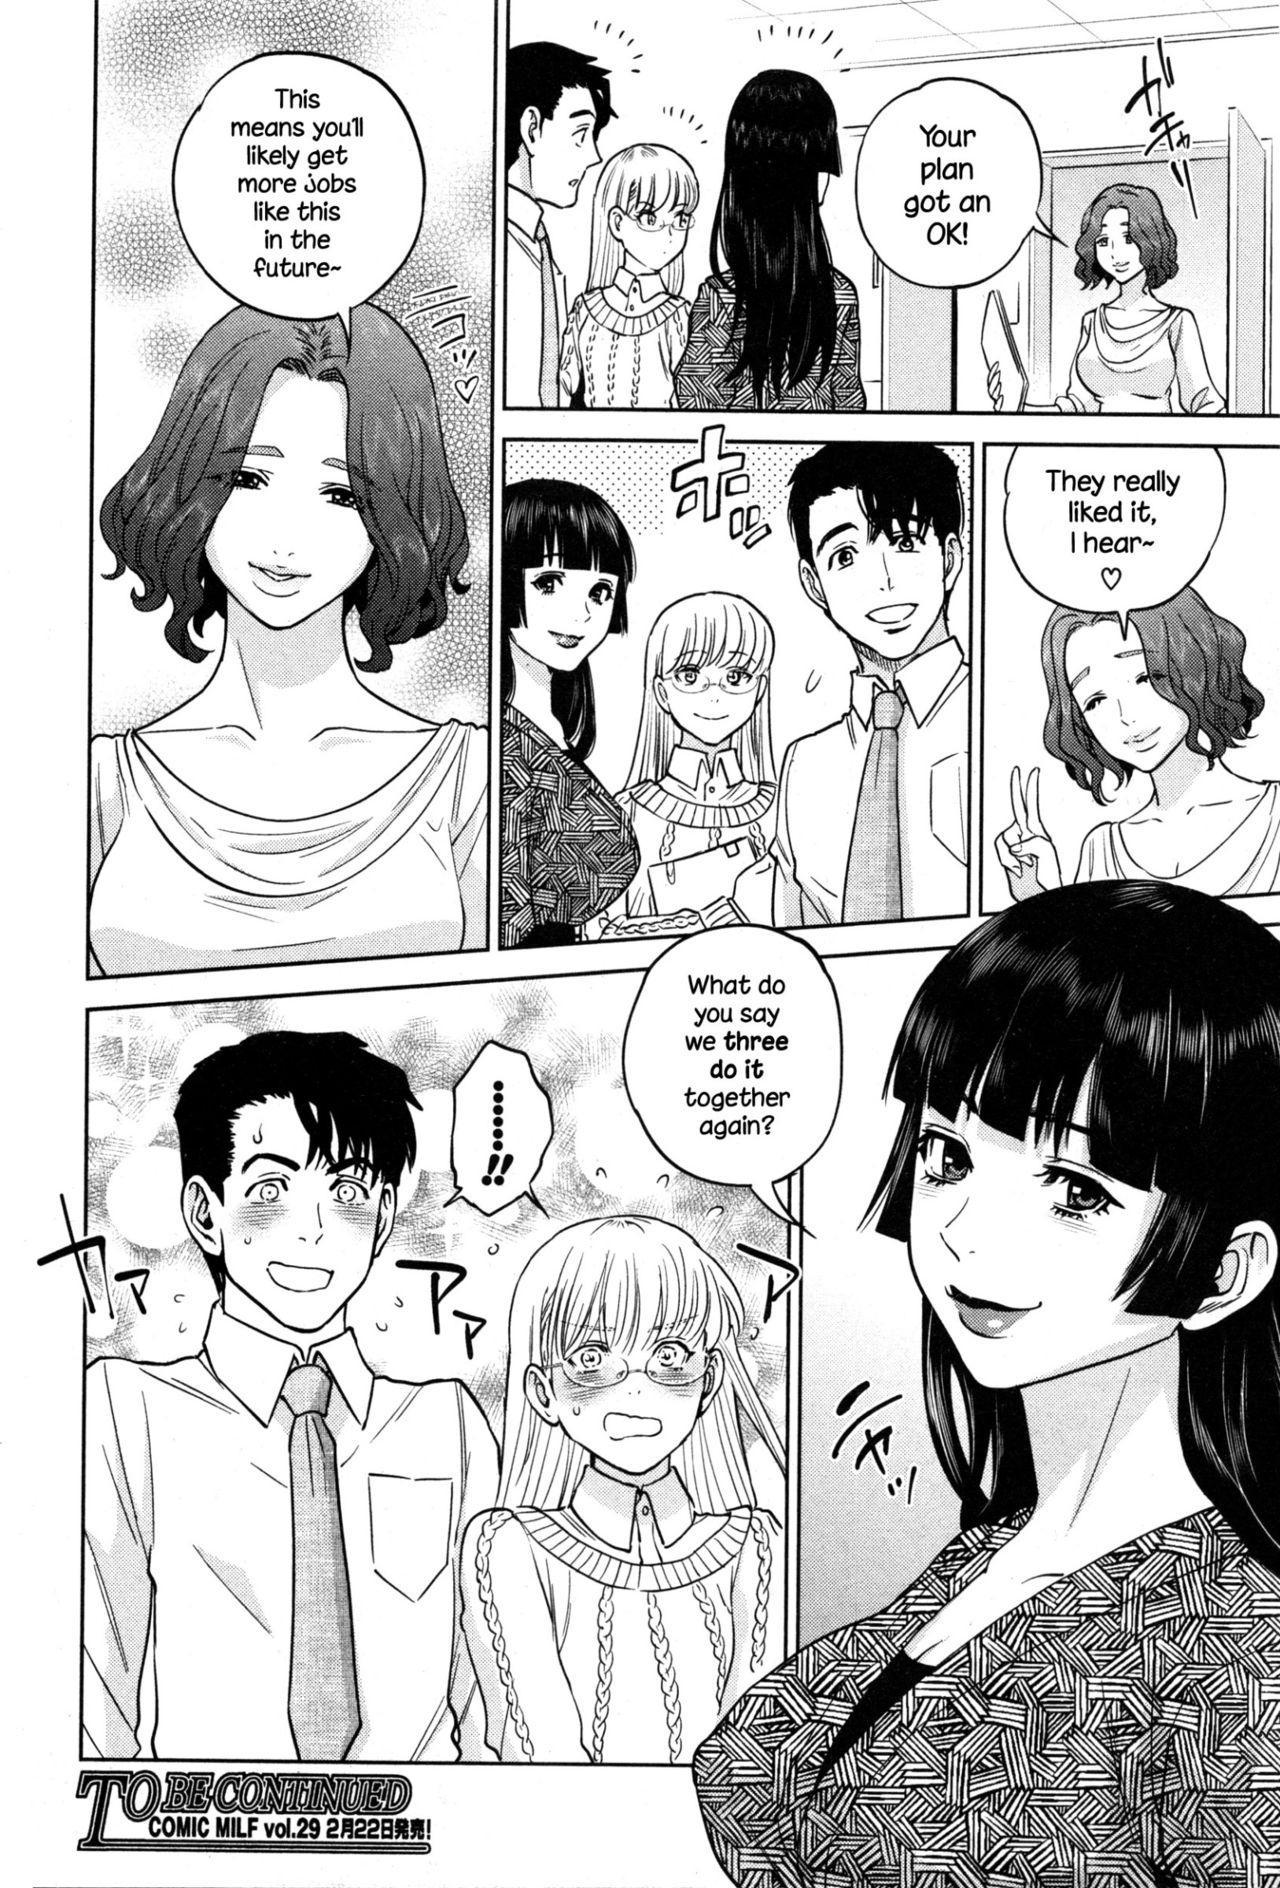 Yuuwaku Office | Office Love Scramble 146